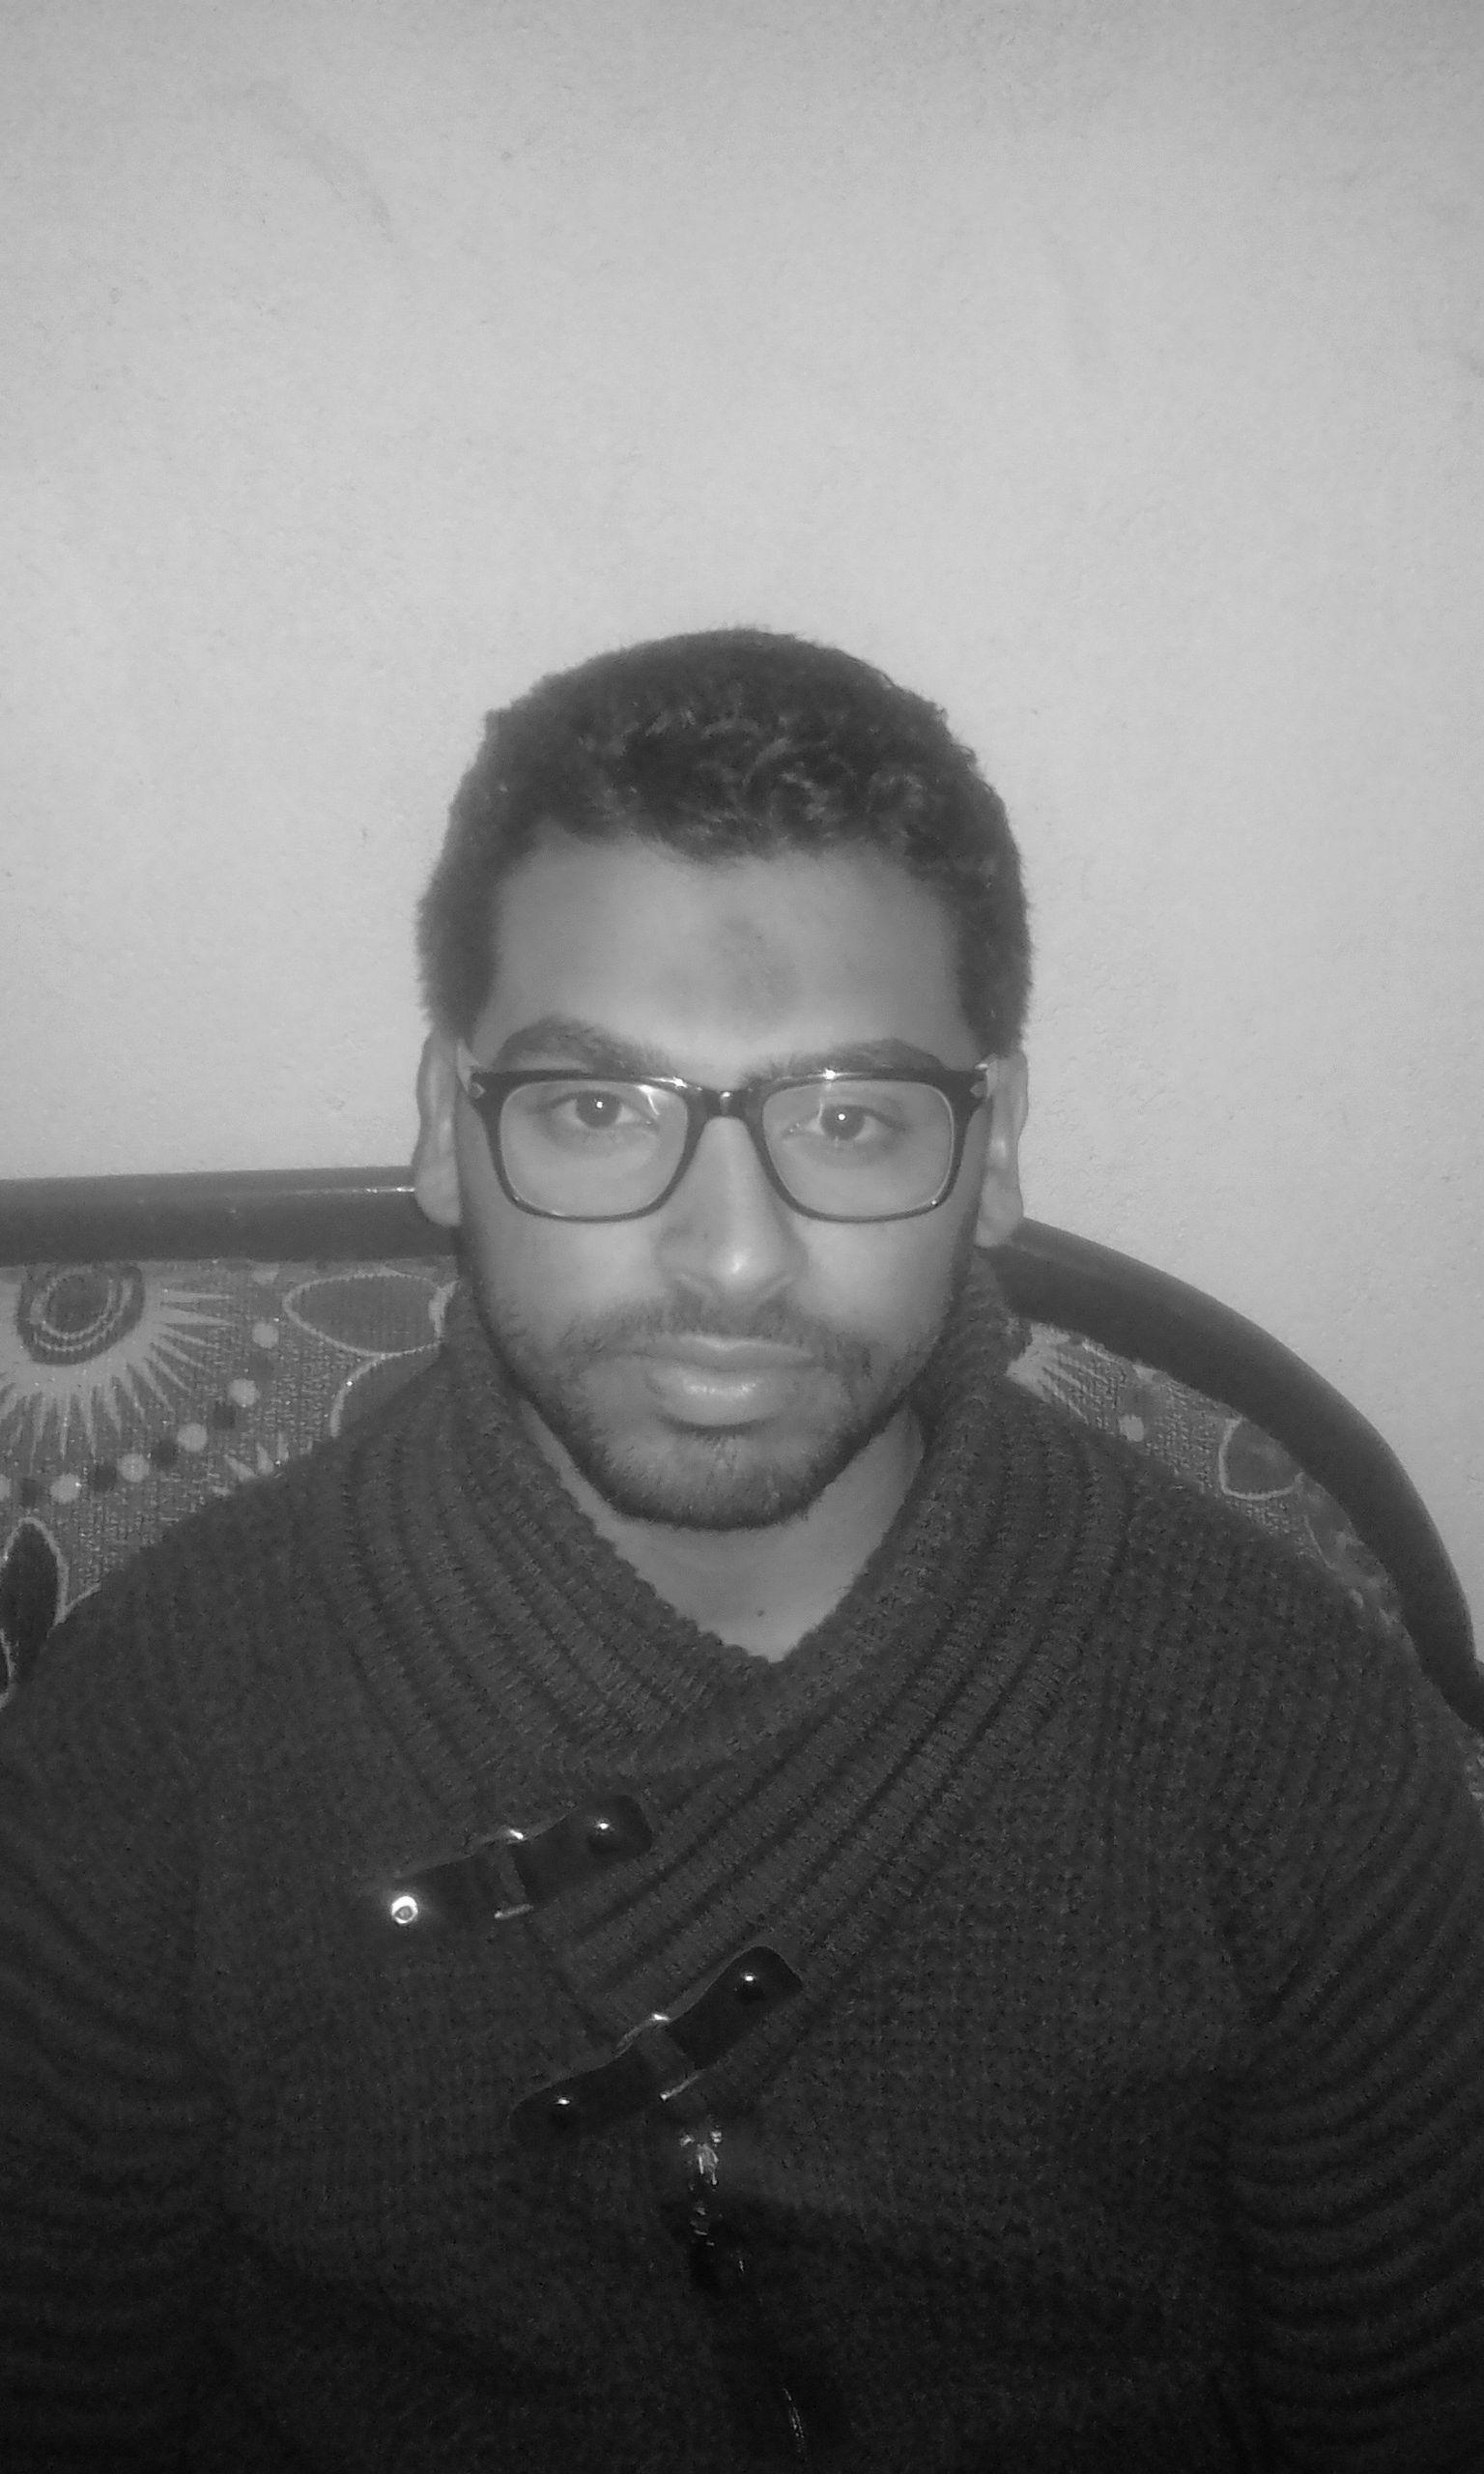 مصطفي محمود عبدالتواب Headshot